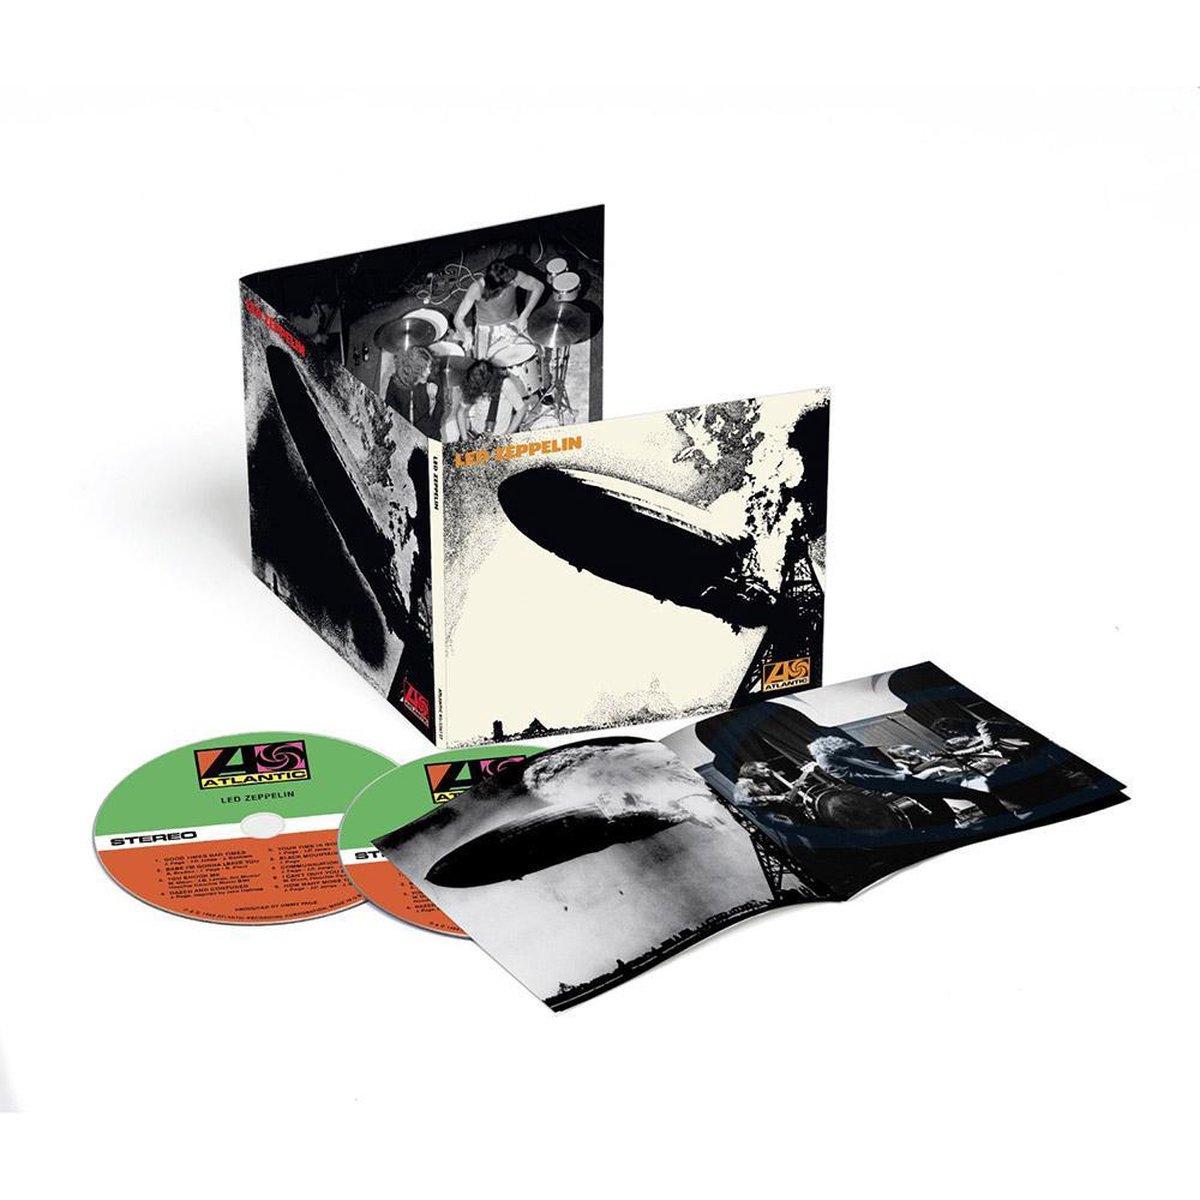 Led Zeppelin - I (Deluxe Edition) - Led Zeppelin